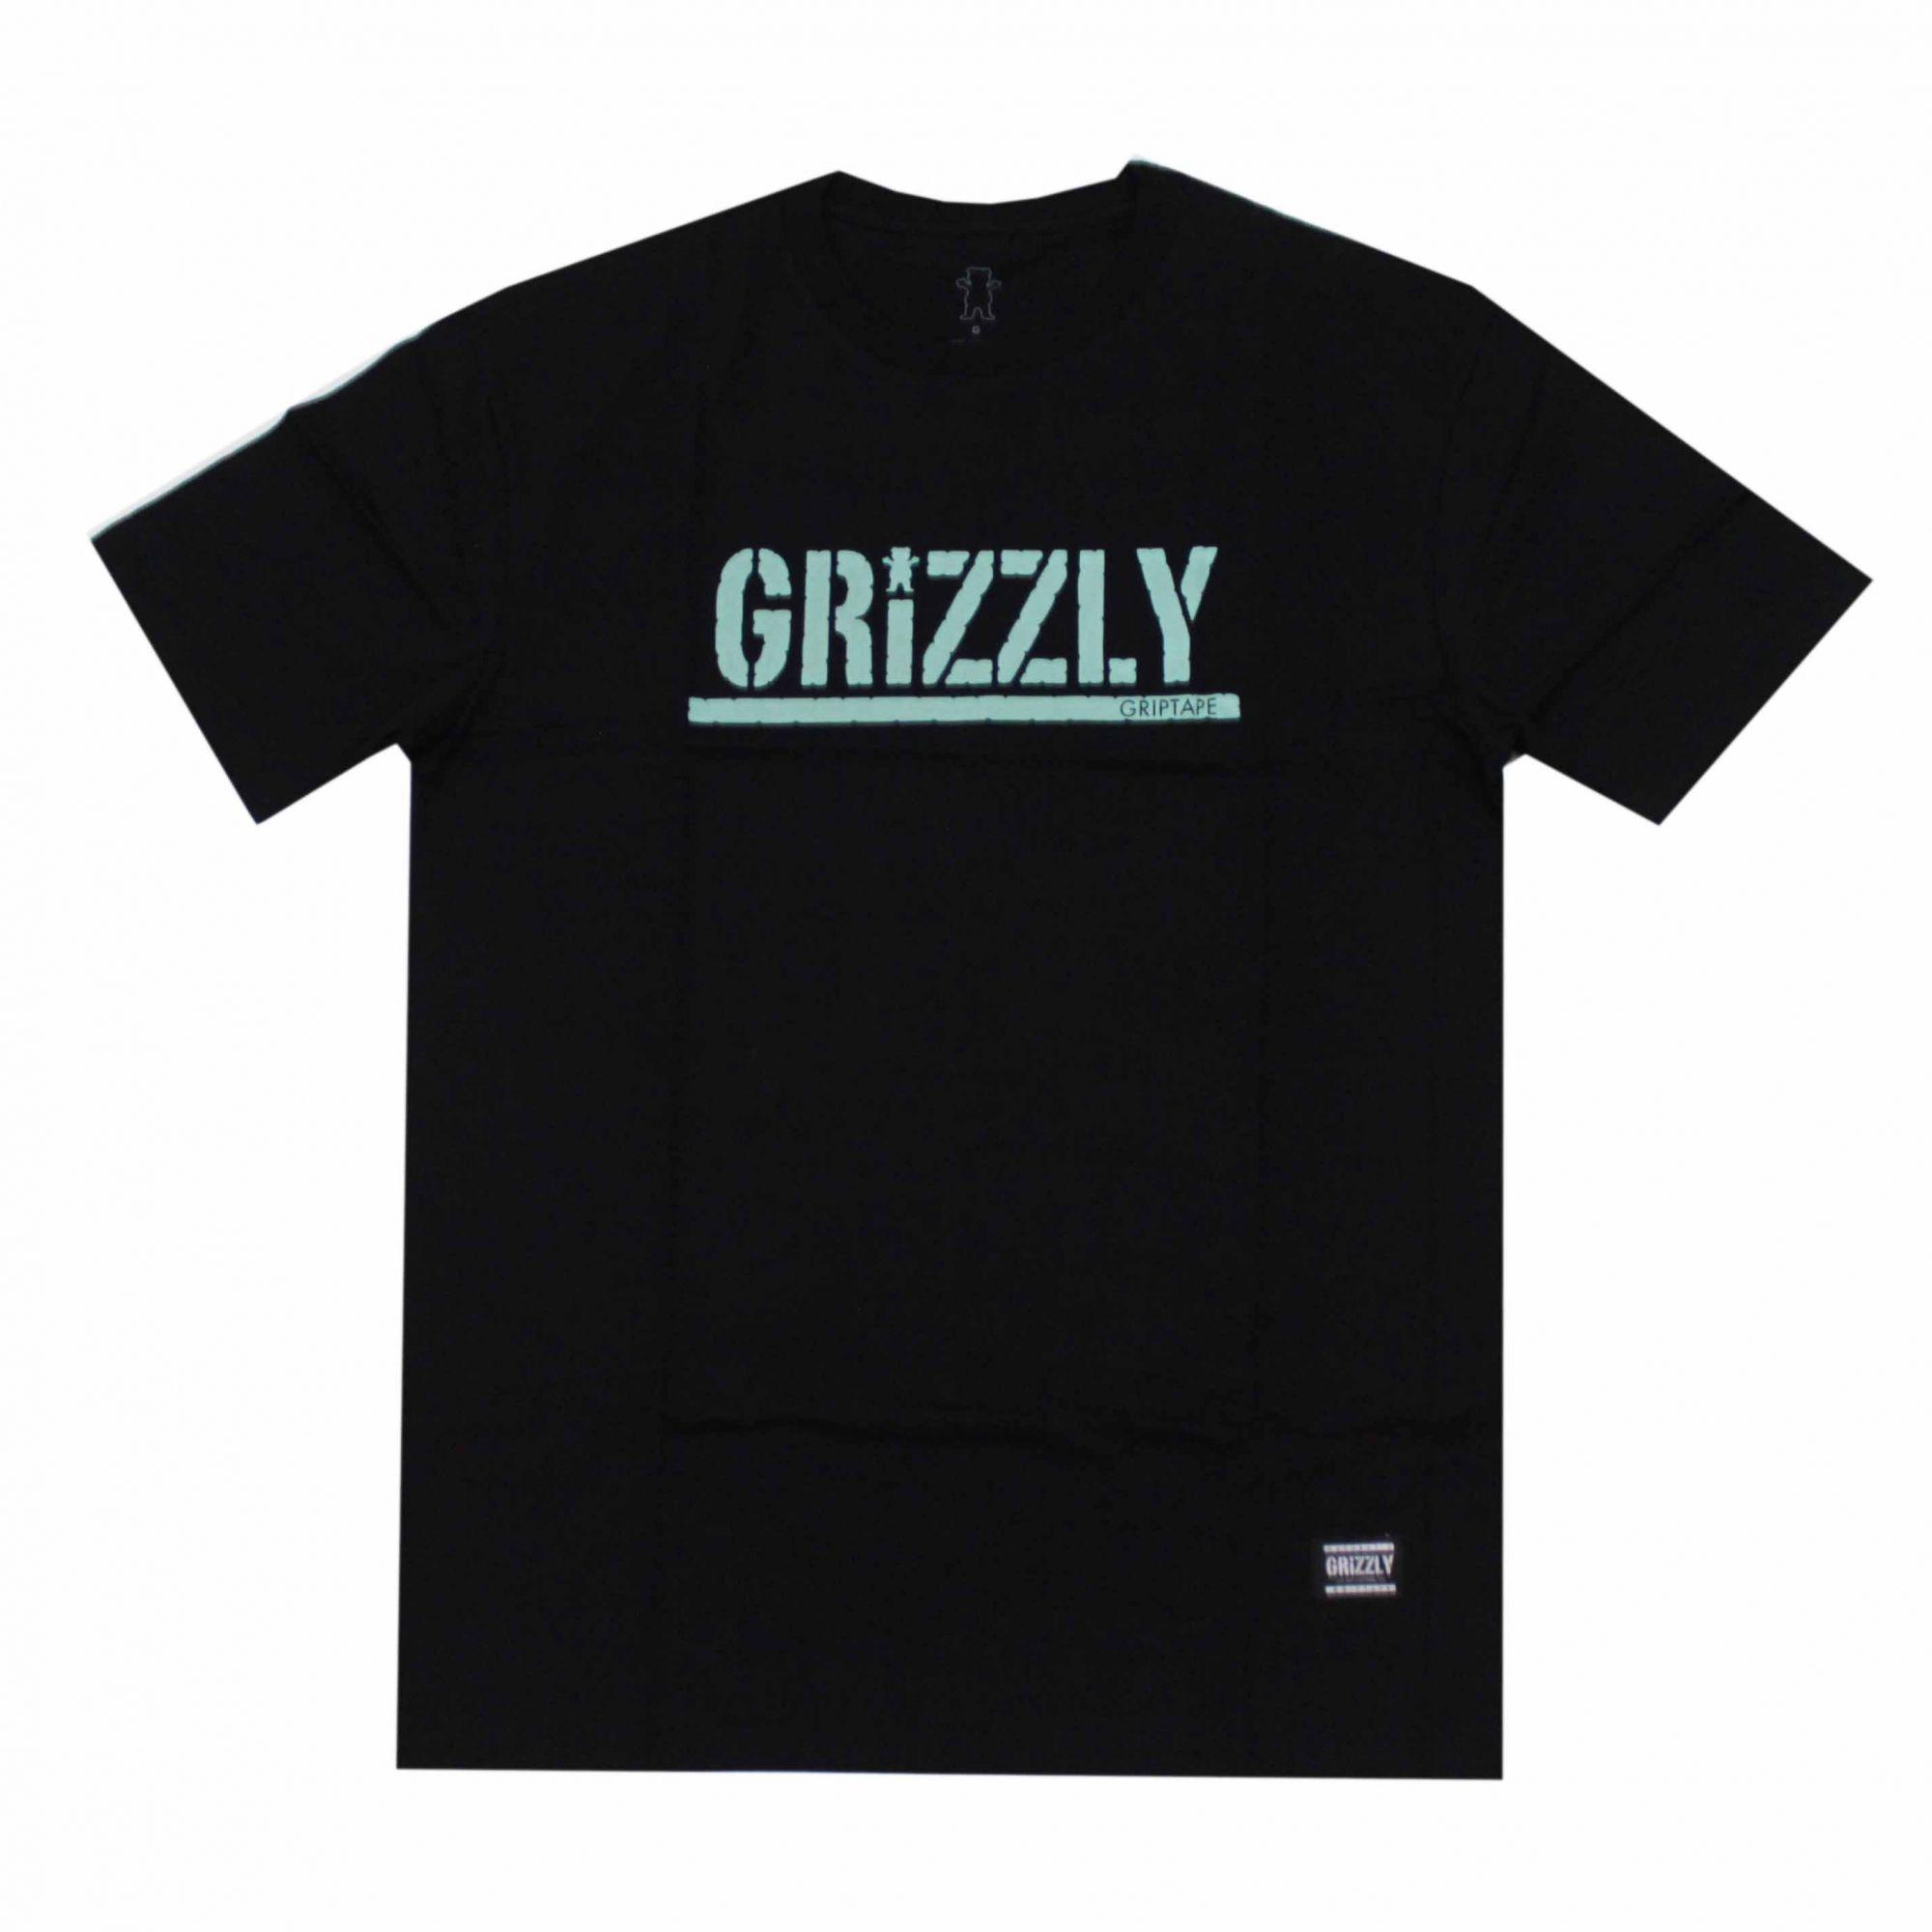 Camiseta Grizzly Stamped Preto/Verde Água